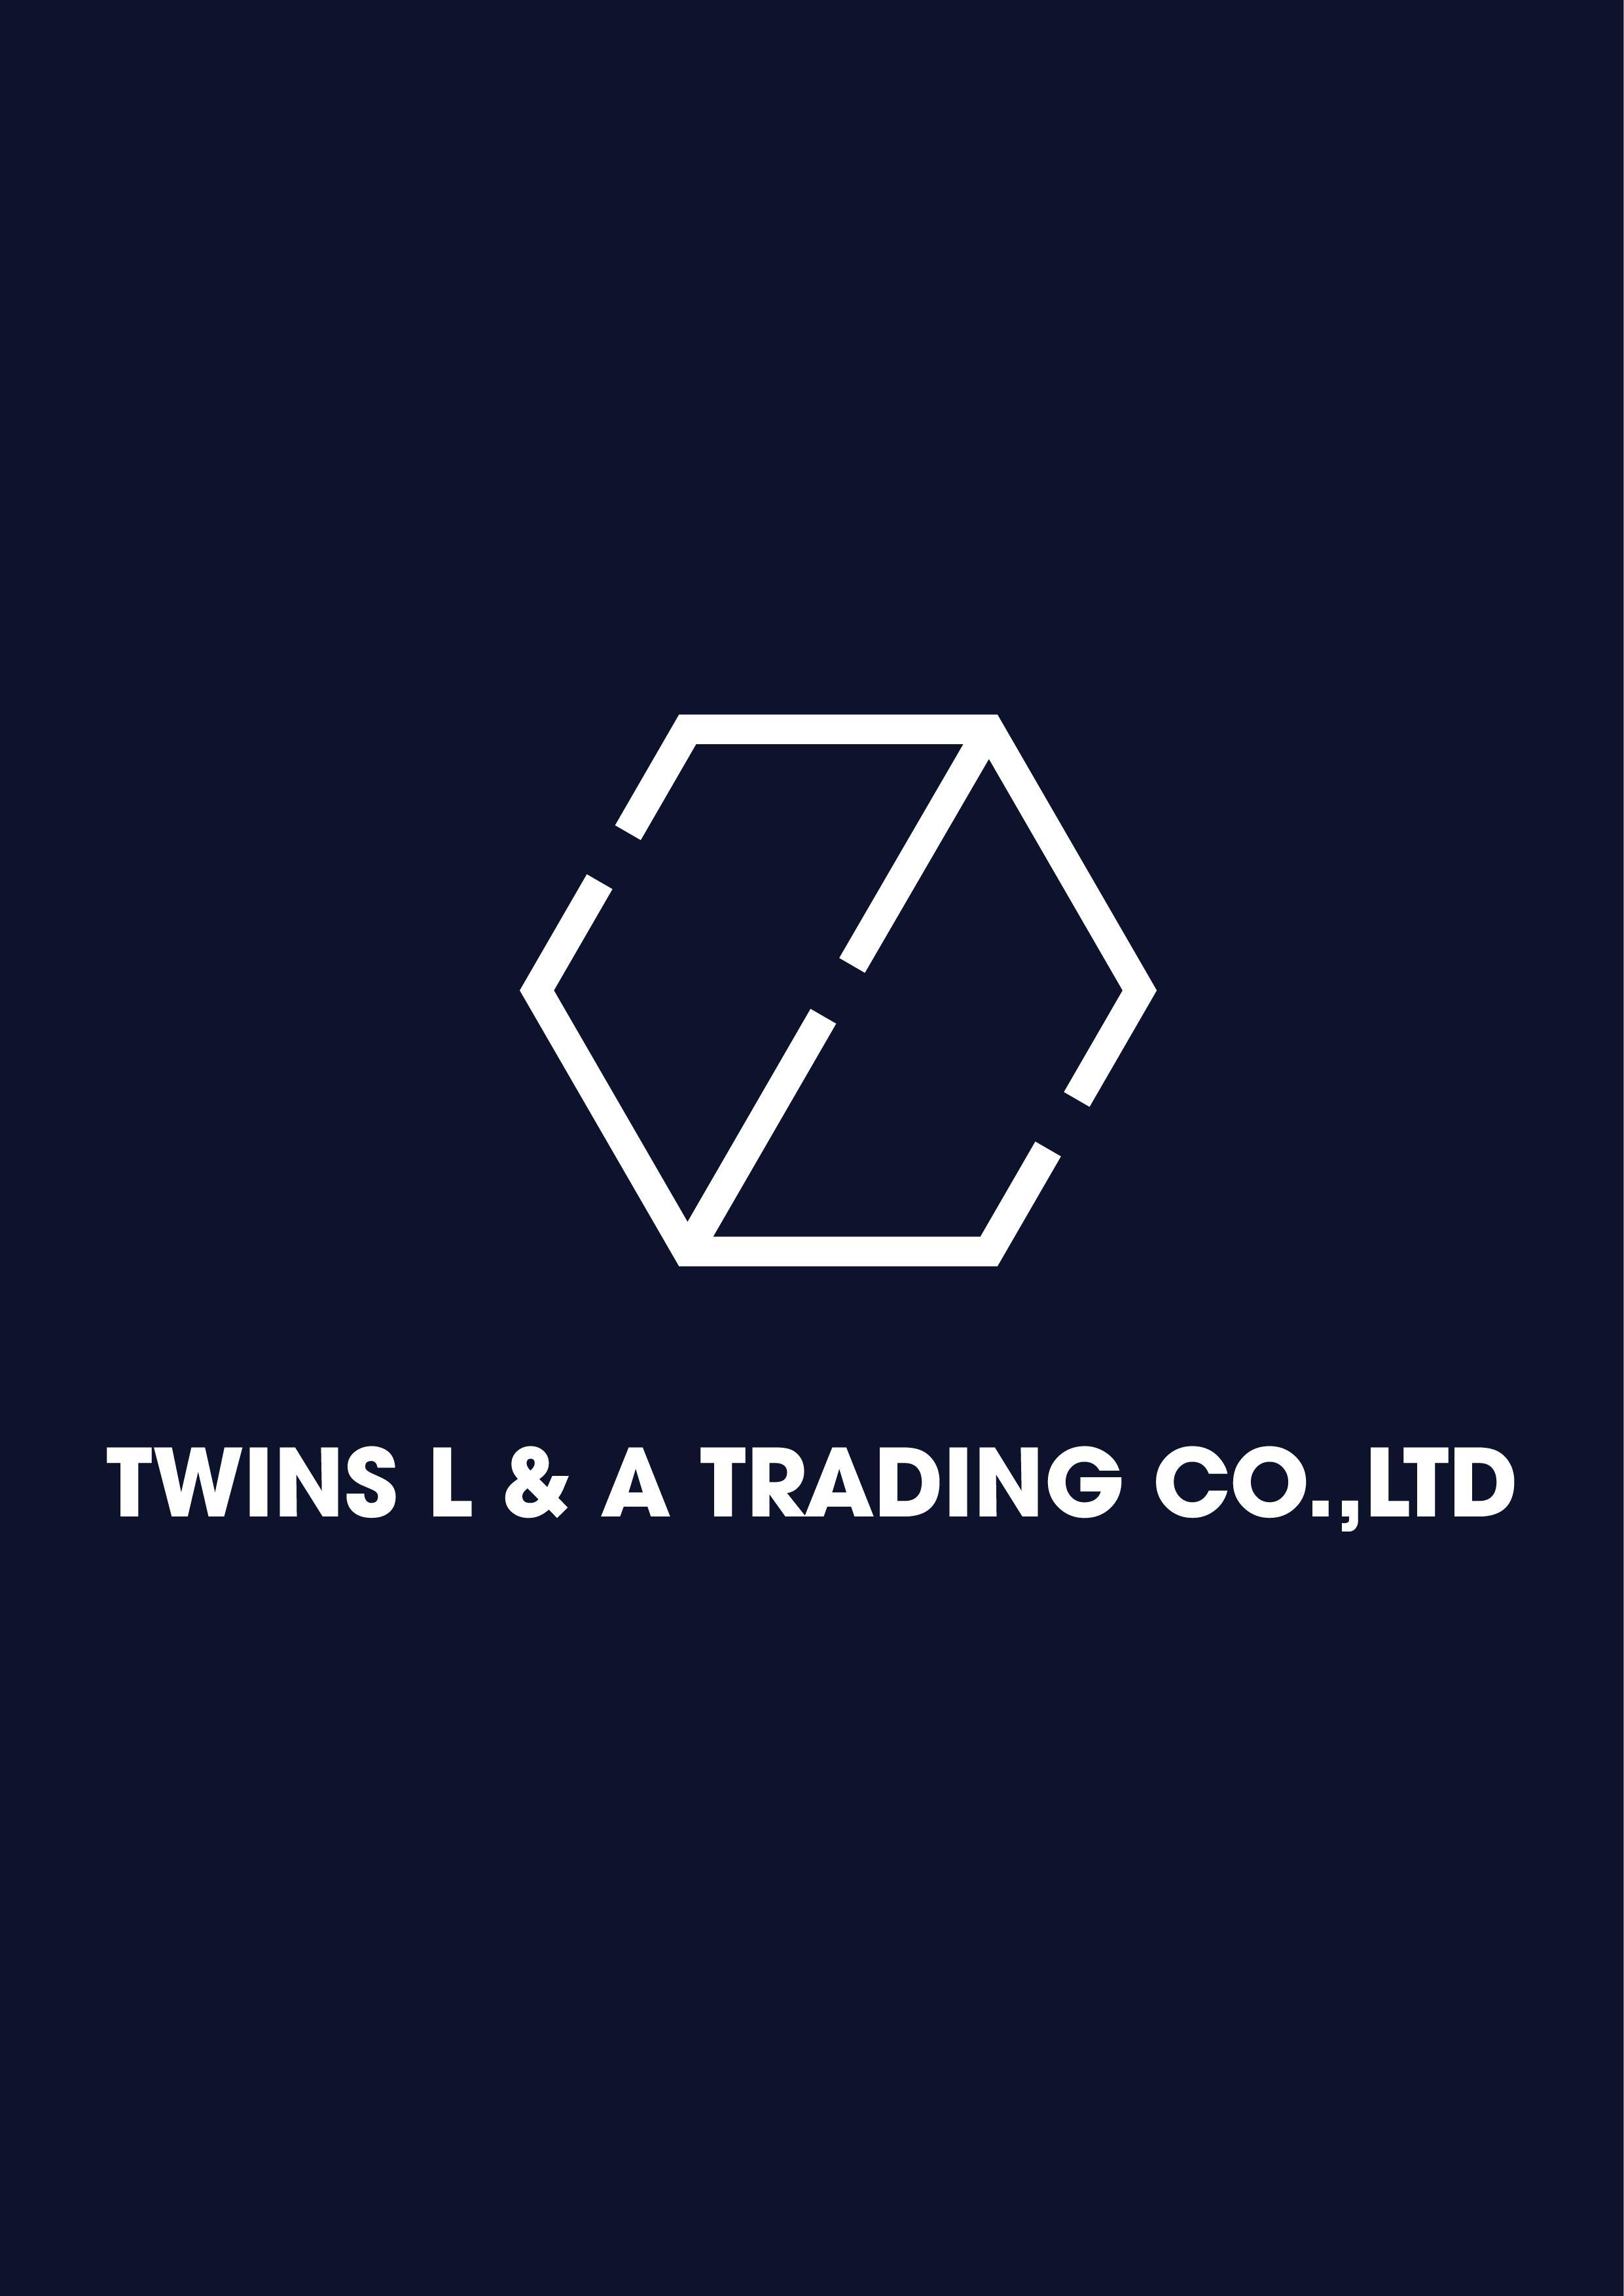 Twins L & A Company